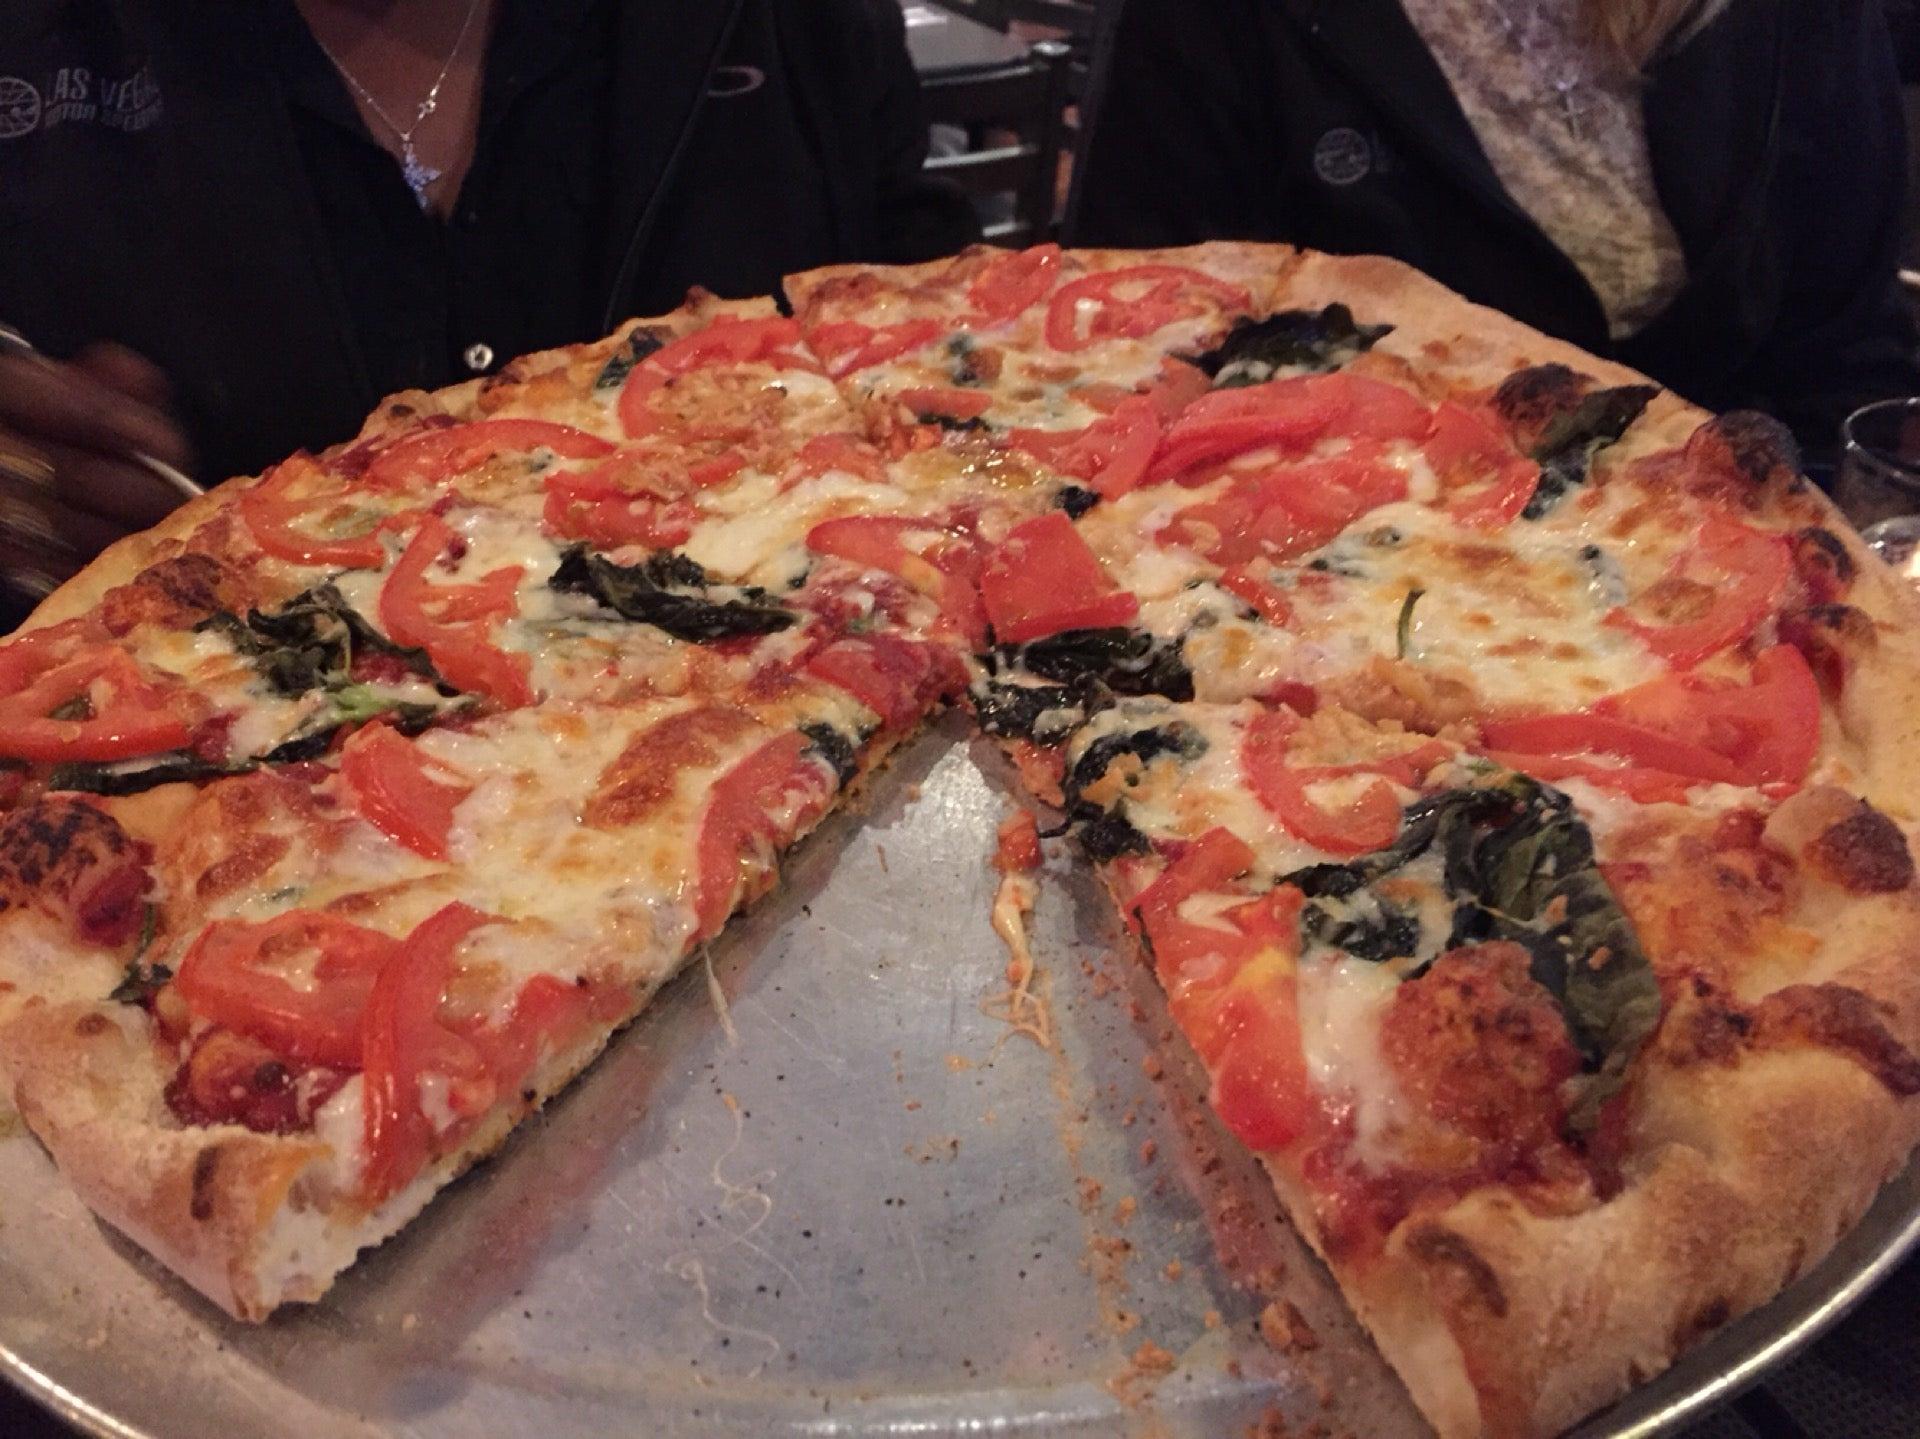 Pepperoni and wild mushroom pizza